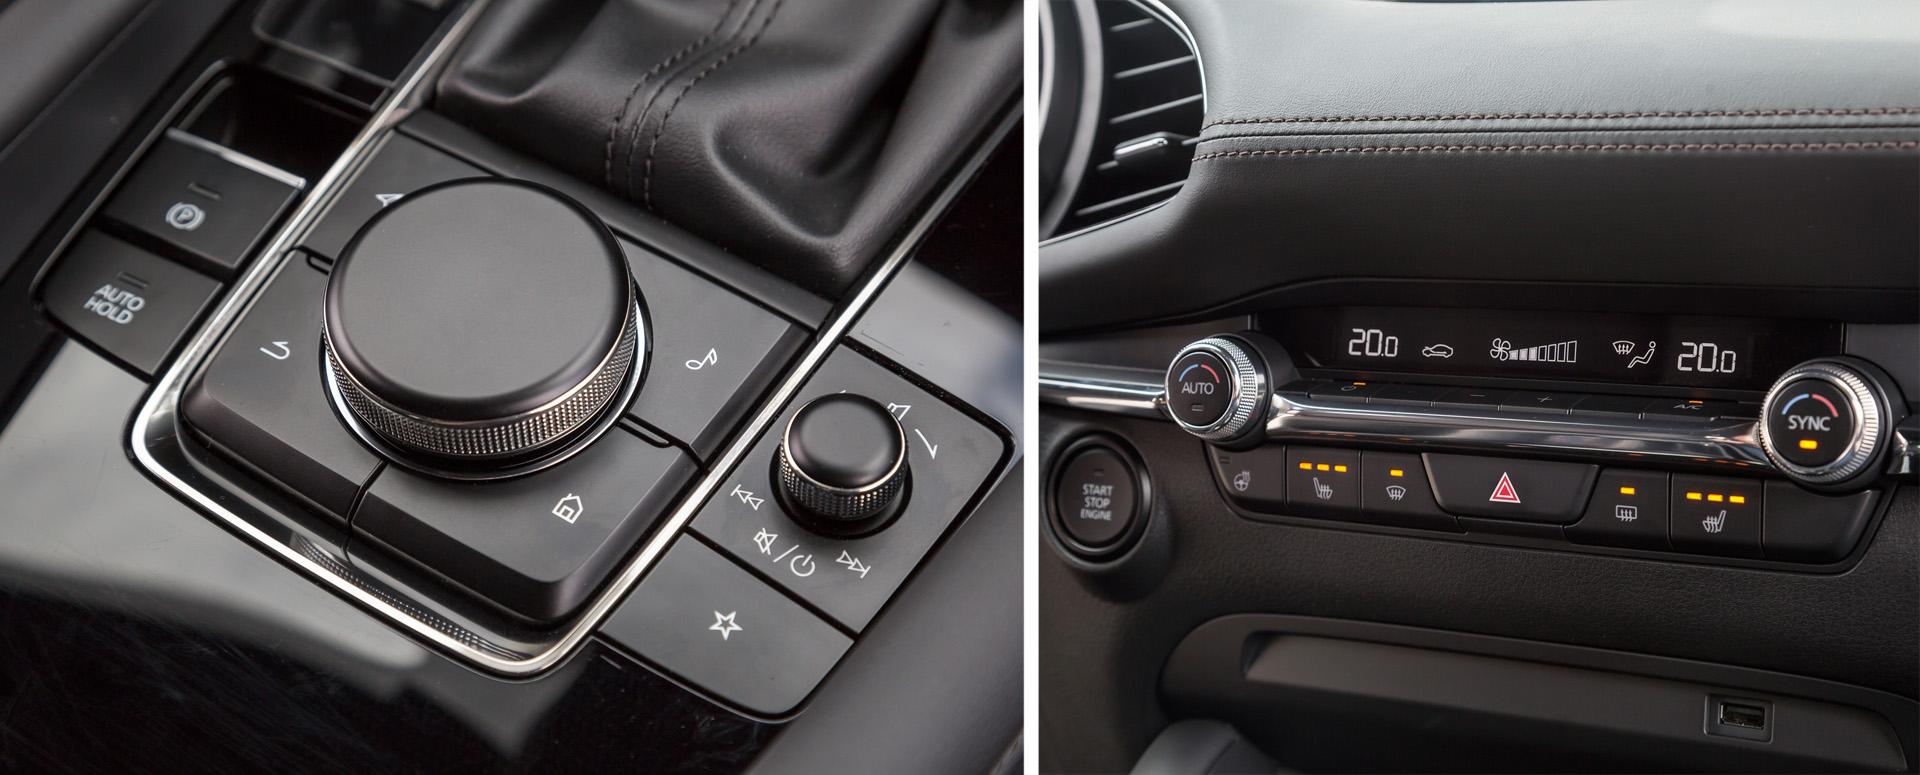 Тест-драйв Mazda 3 2019: Матрешкин труд